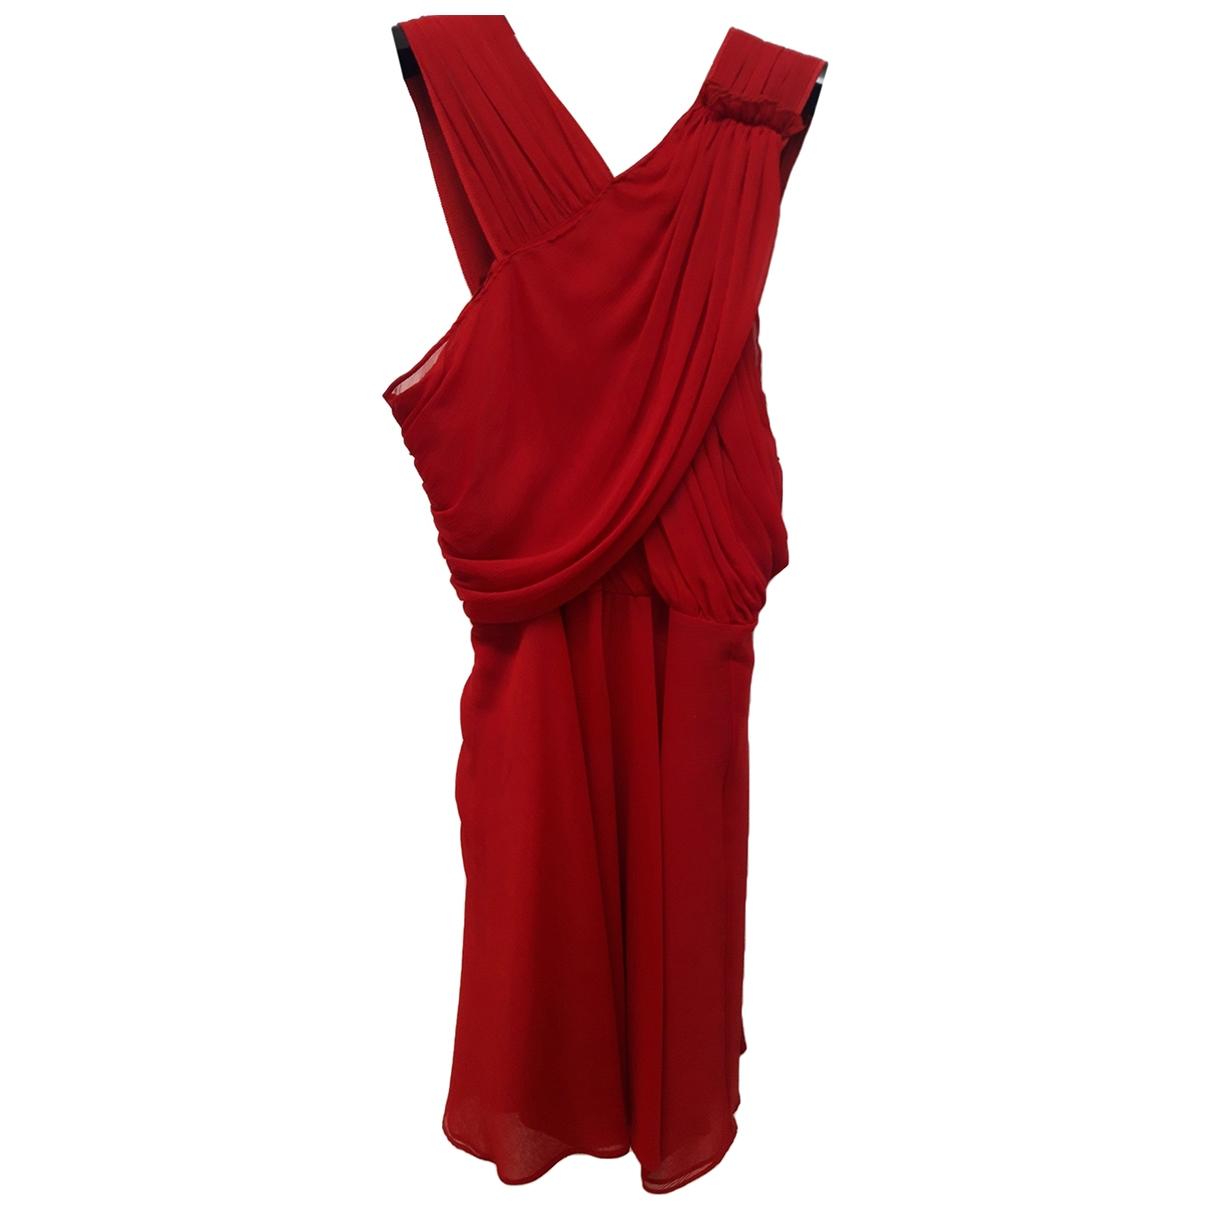 The Kooples \N Red dress for Women 38 FR